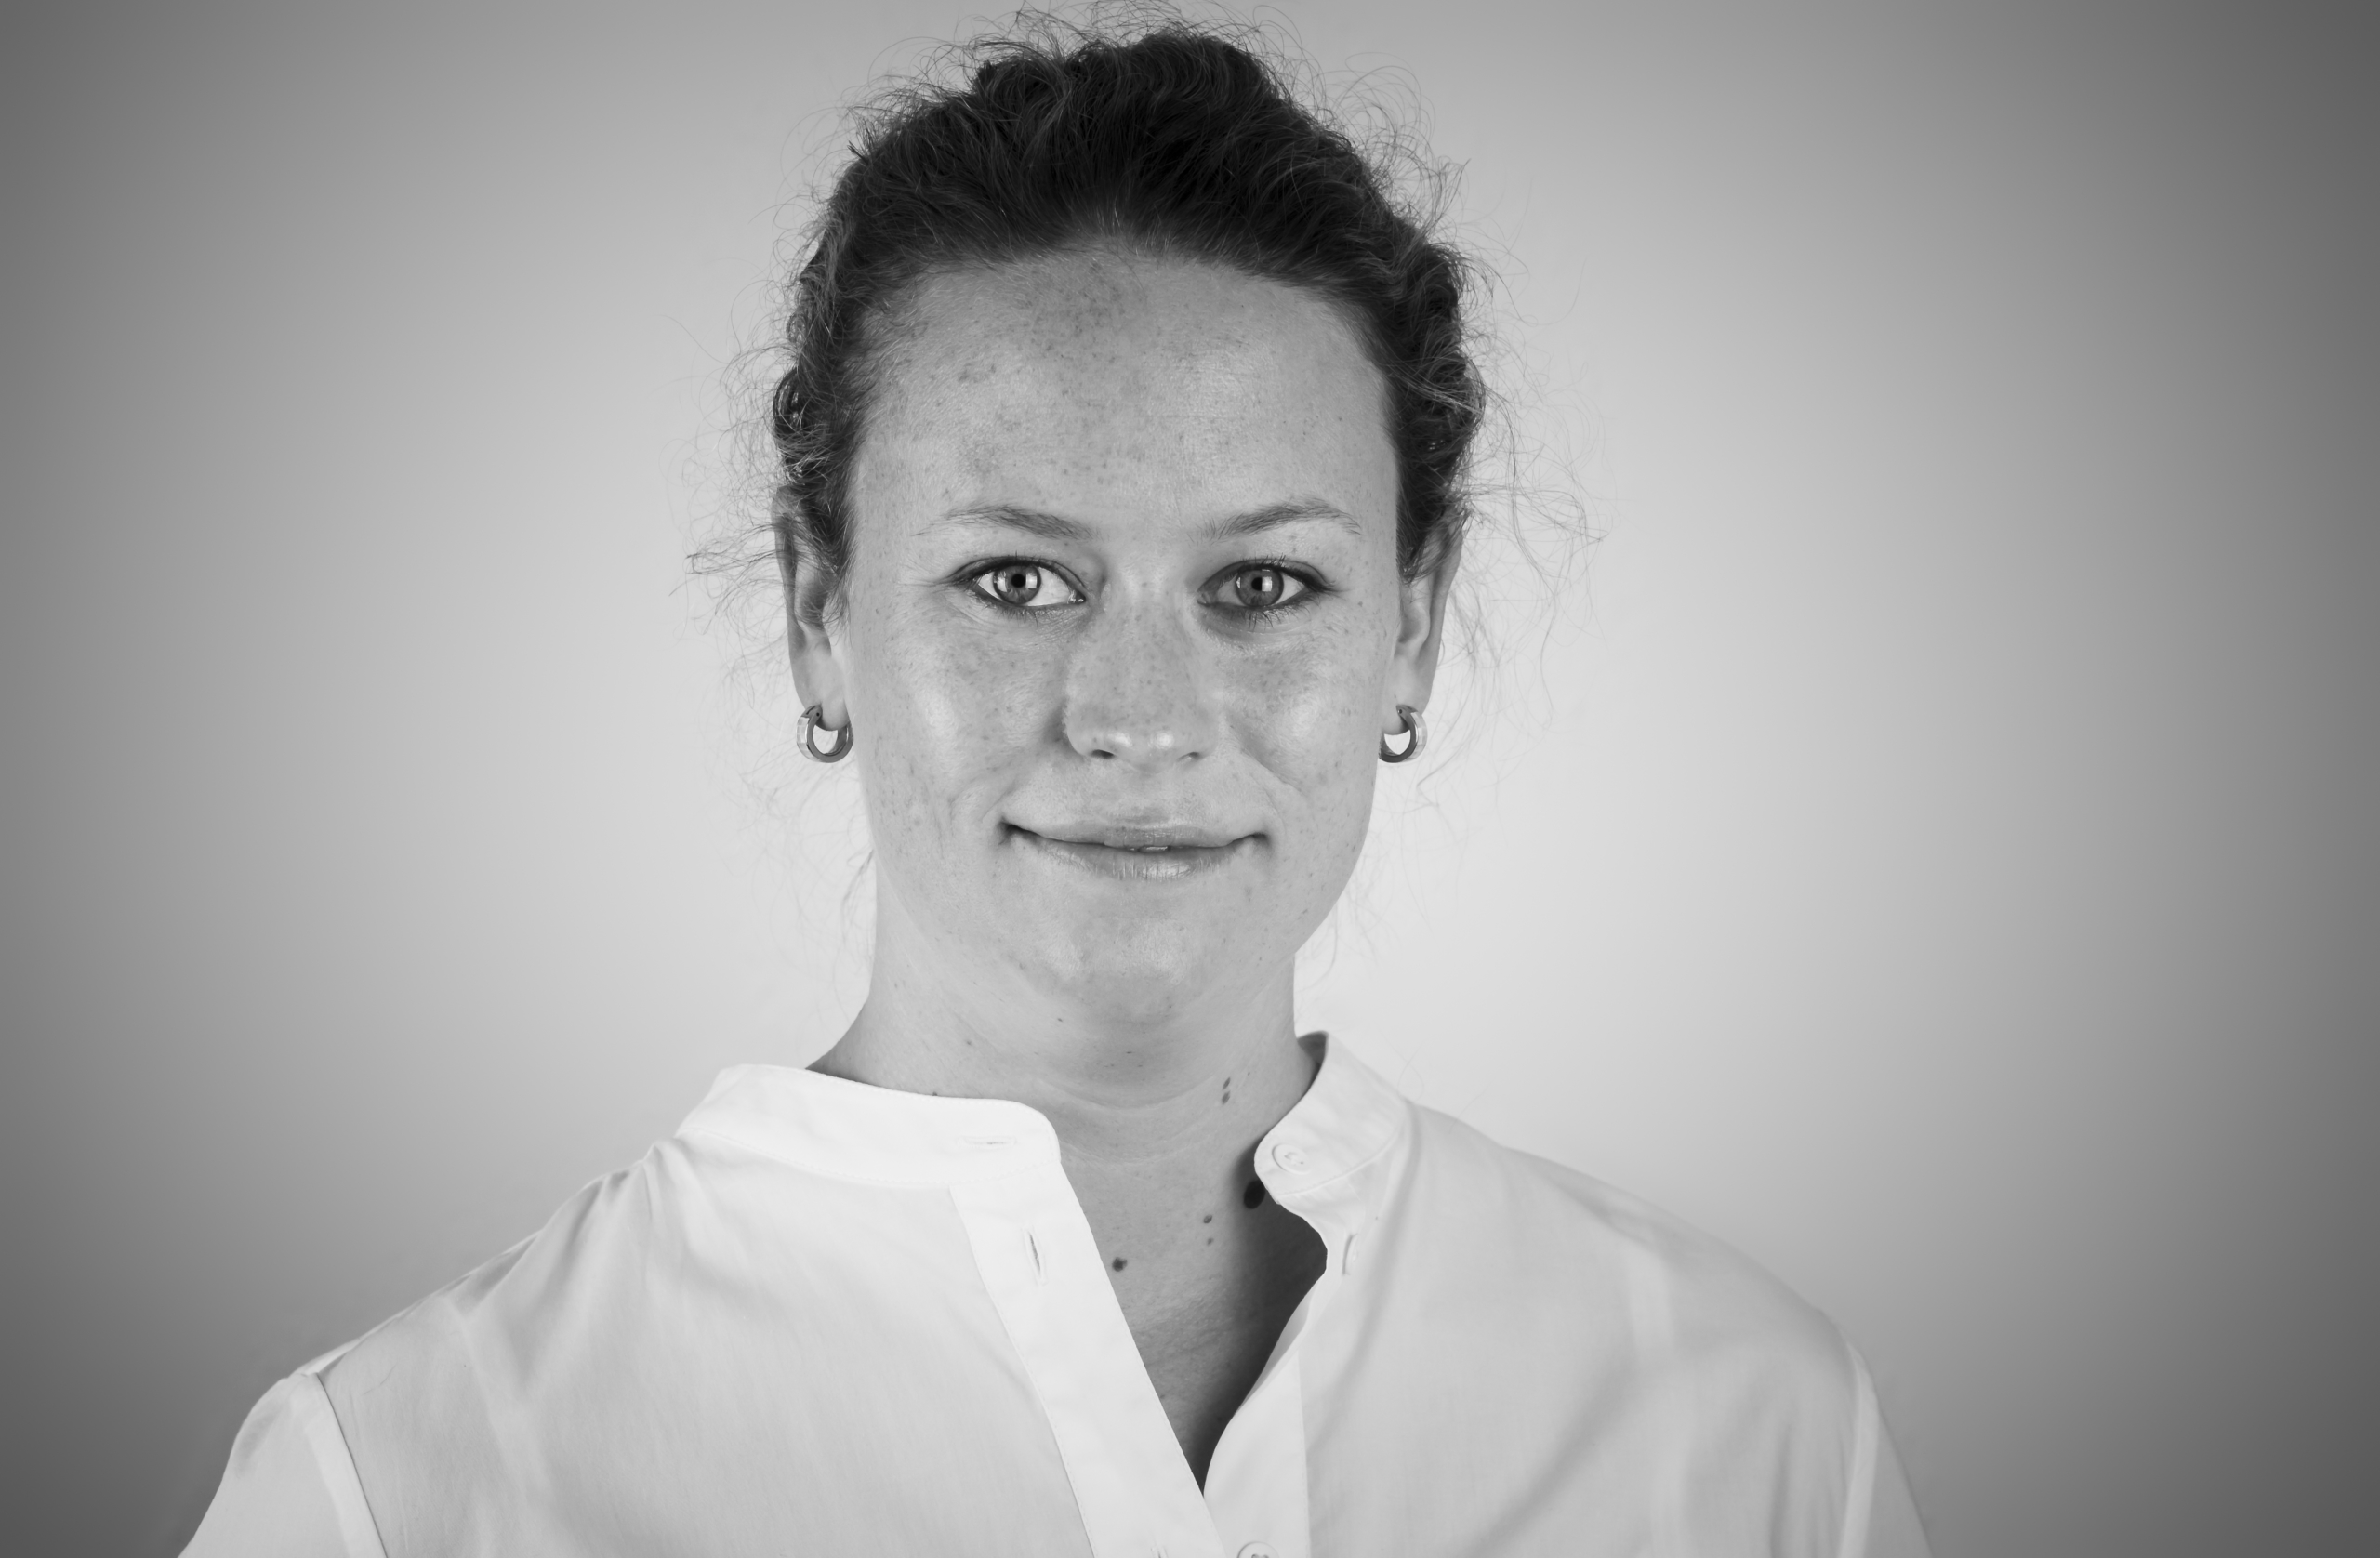 Umwelttechnik Anja Finke arccon Ingenieursgesellschaft Gelsenkirchen Ingenieurbüro